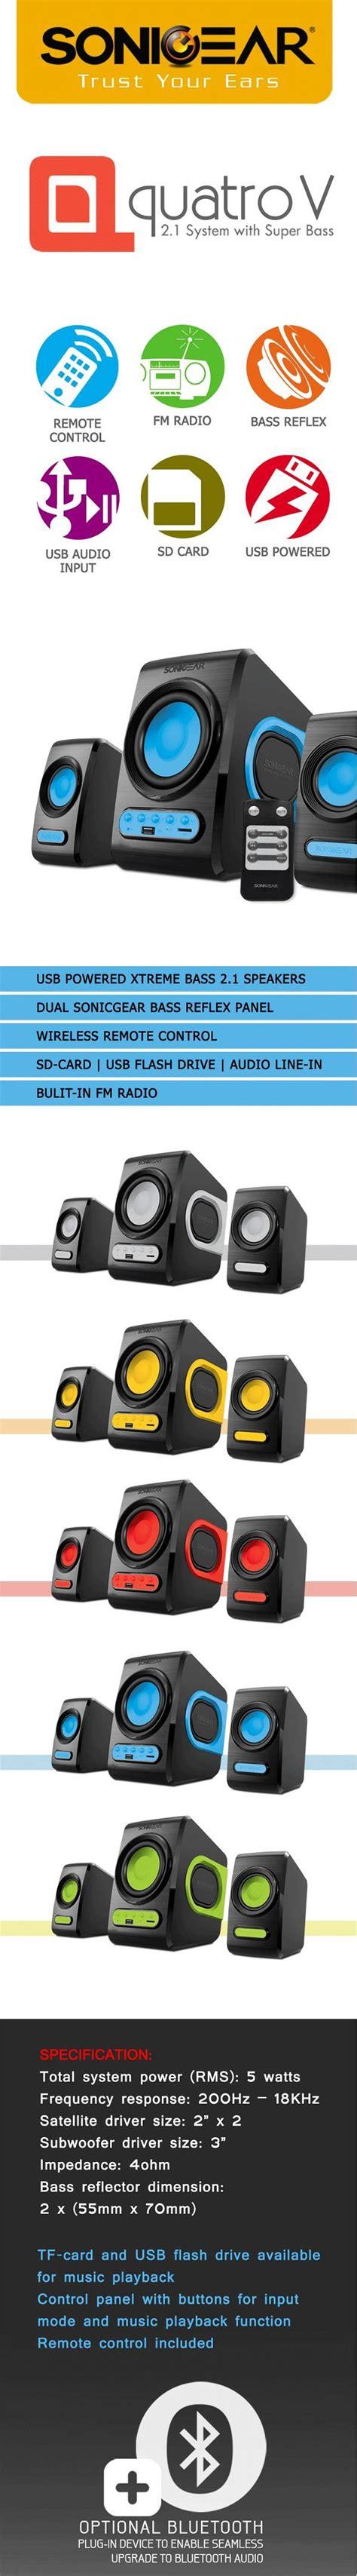 Speaker Sonicgear Quatro V Bass Pc Laptop Notebook Grey sonic gear quatro v powered by usb end 1 19 2019 5 15 pm